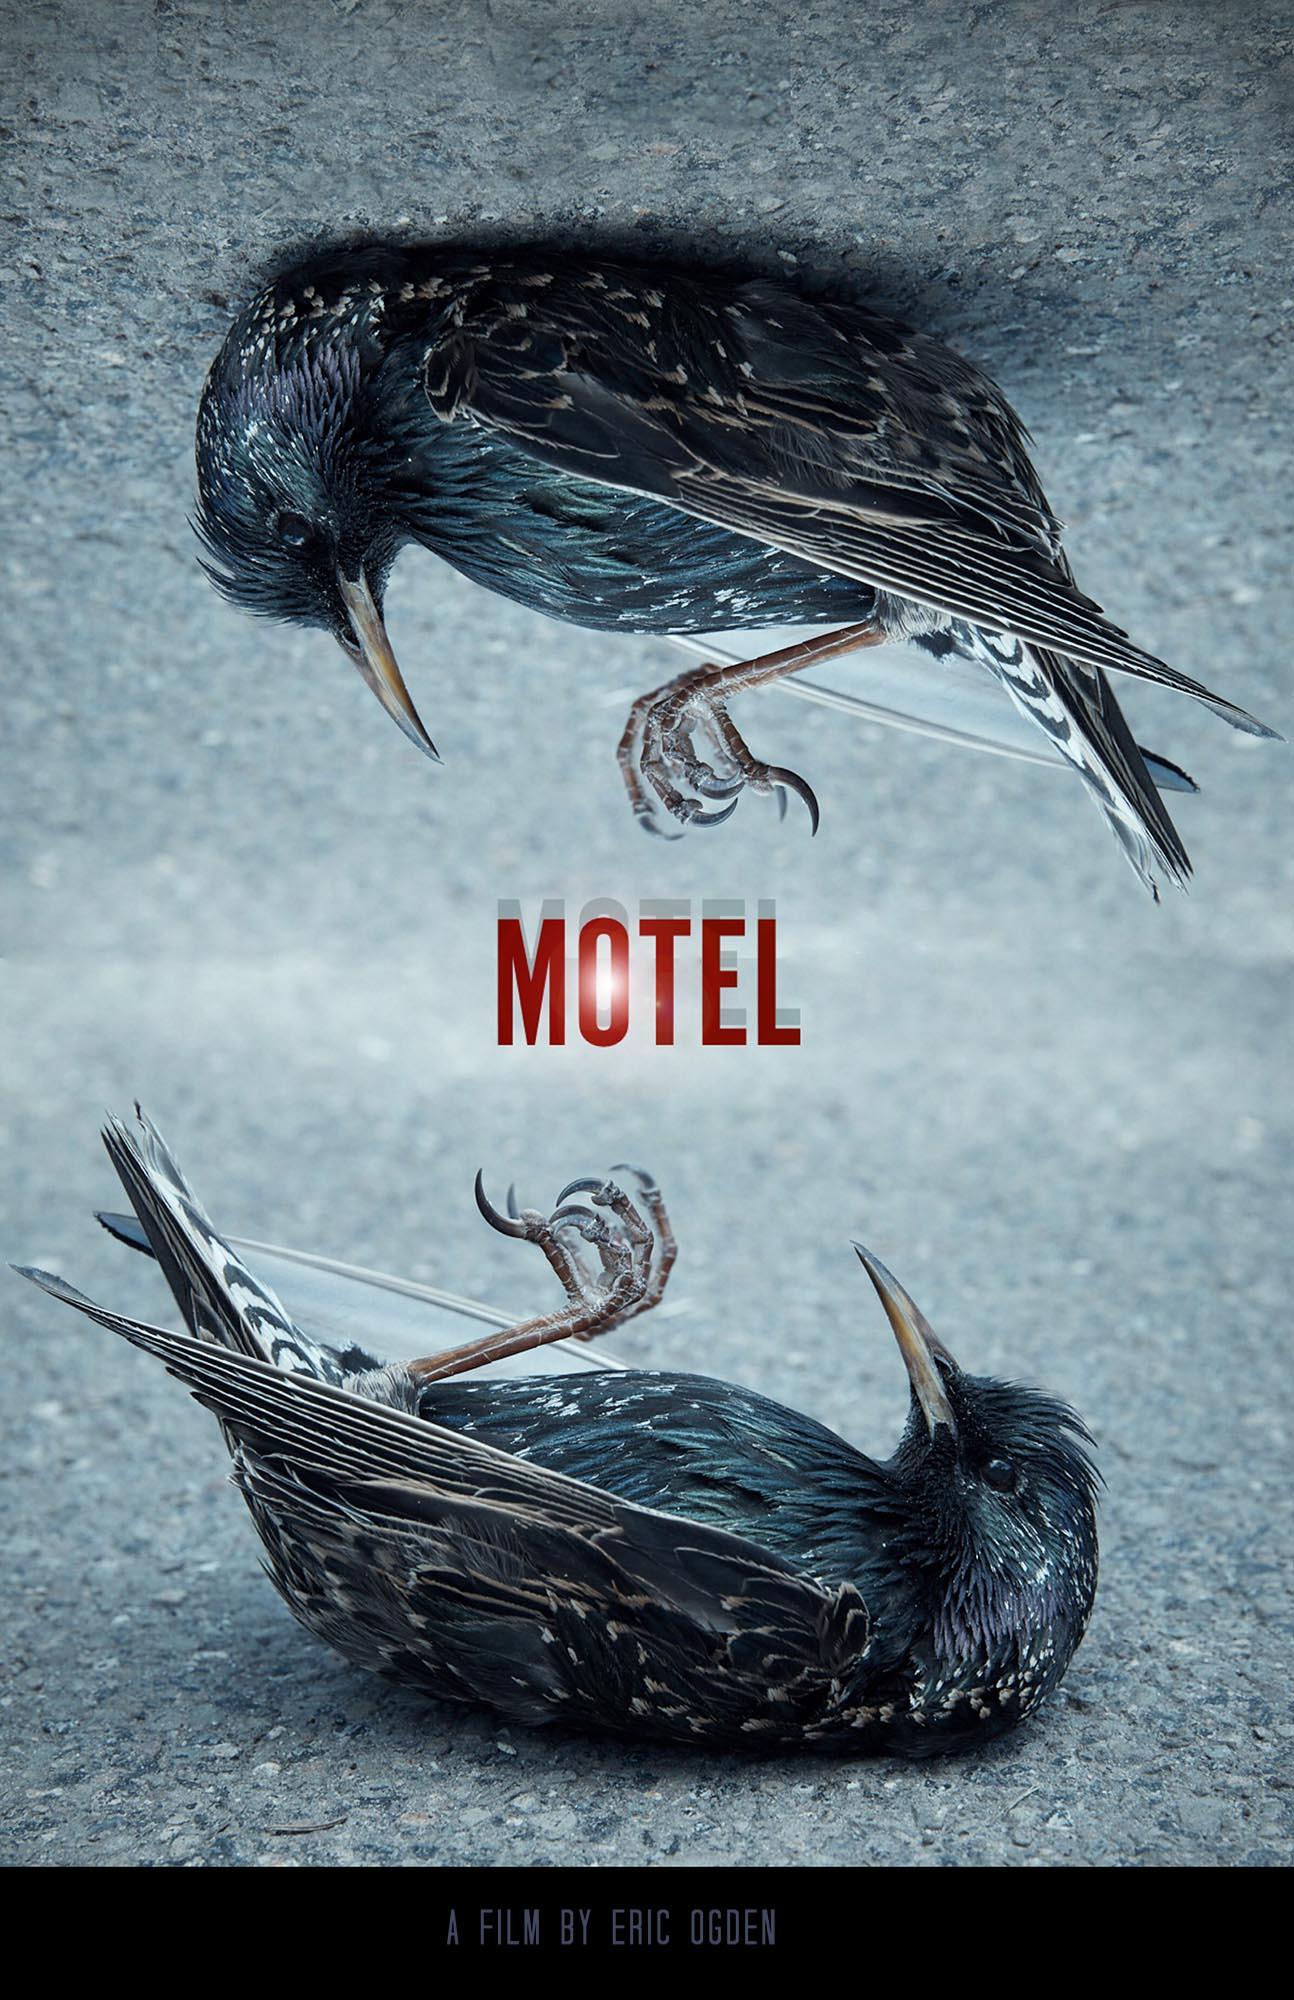 MOTEL_poster_9A_Web.jpg